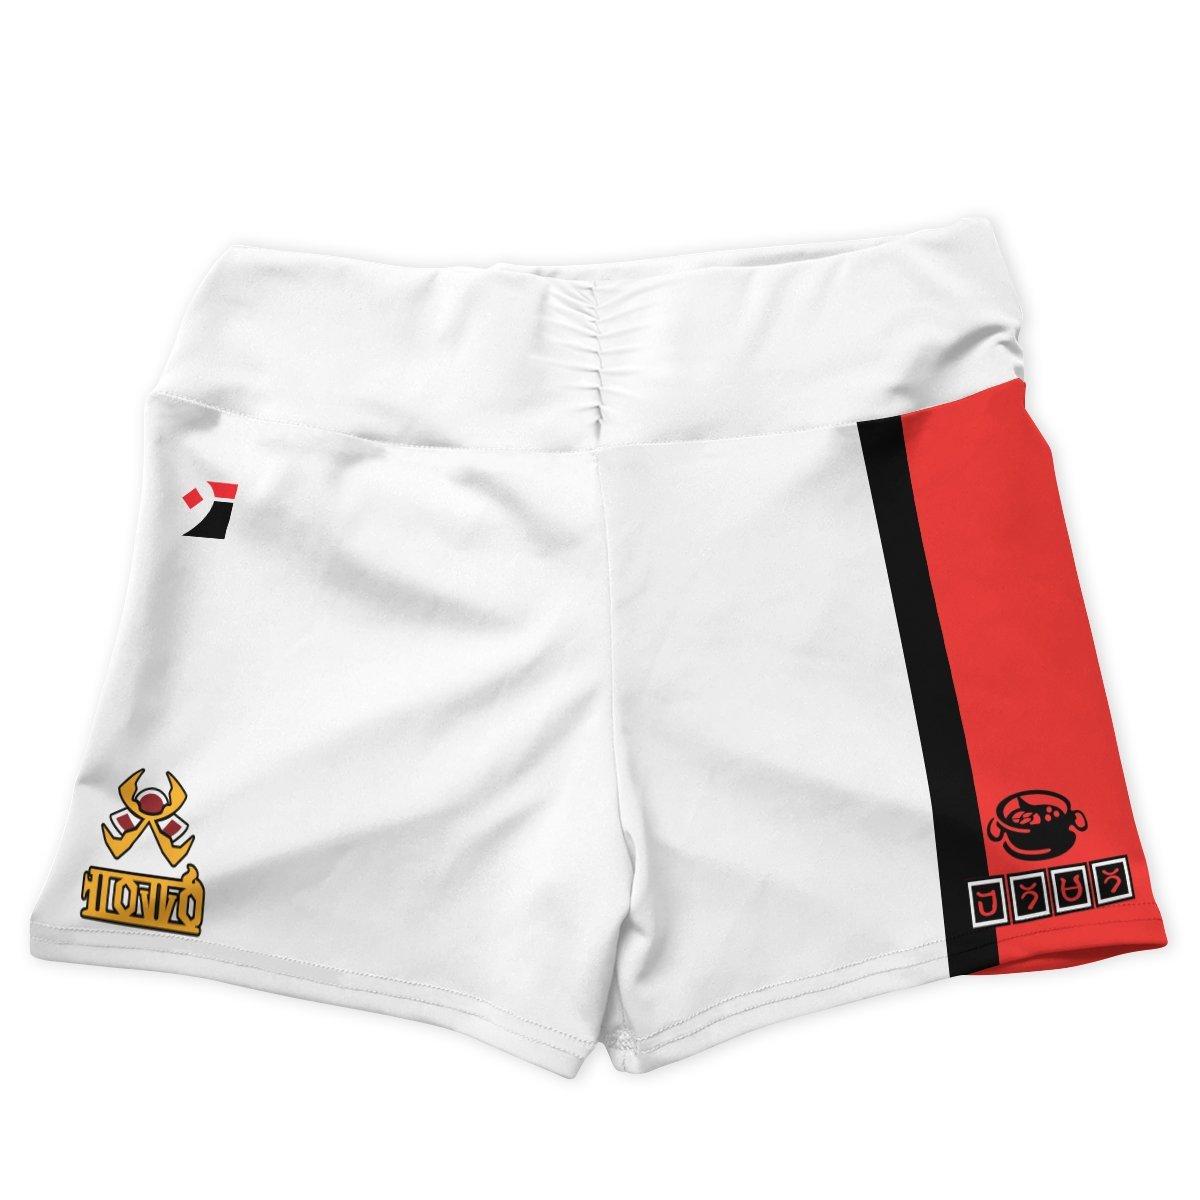 pokemon fire uniform active wear set 622209 - Anime Swimsuits